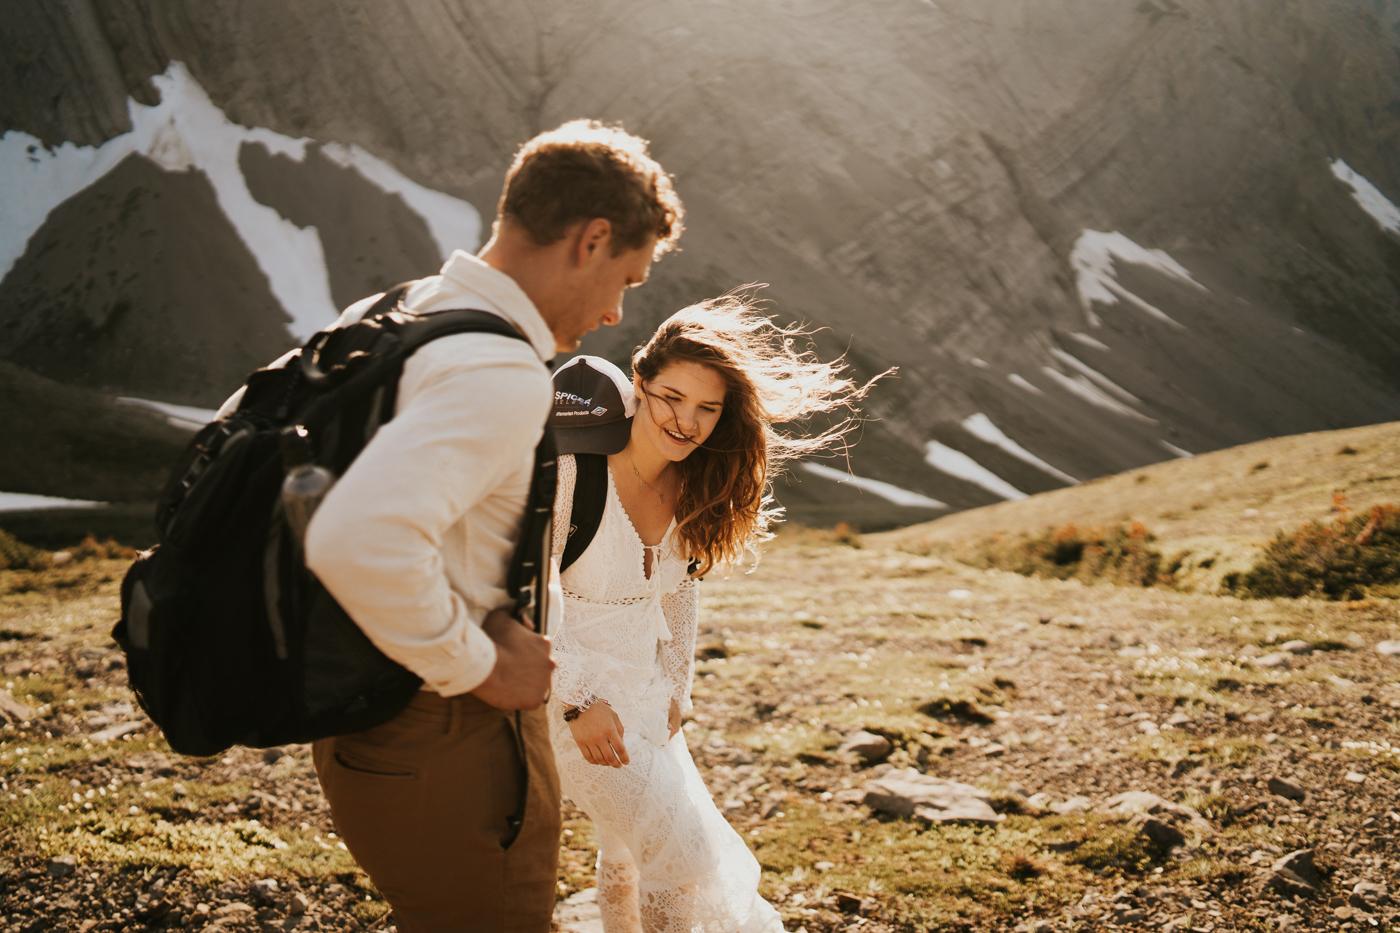 tyraephotography_photographer_wedding_elopement_engagement_photography-08492.jpg